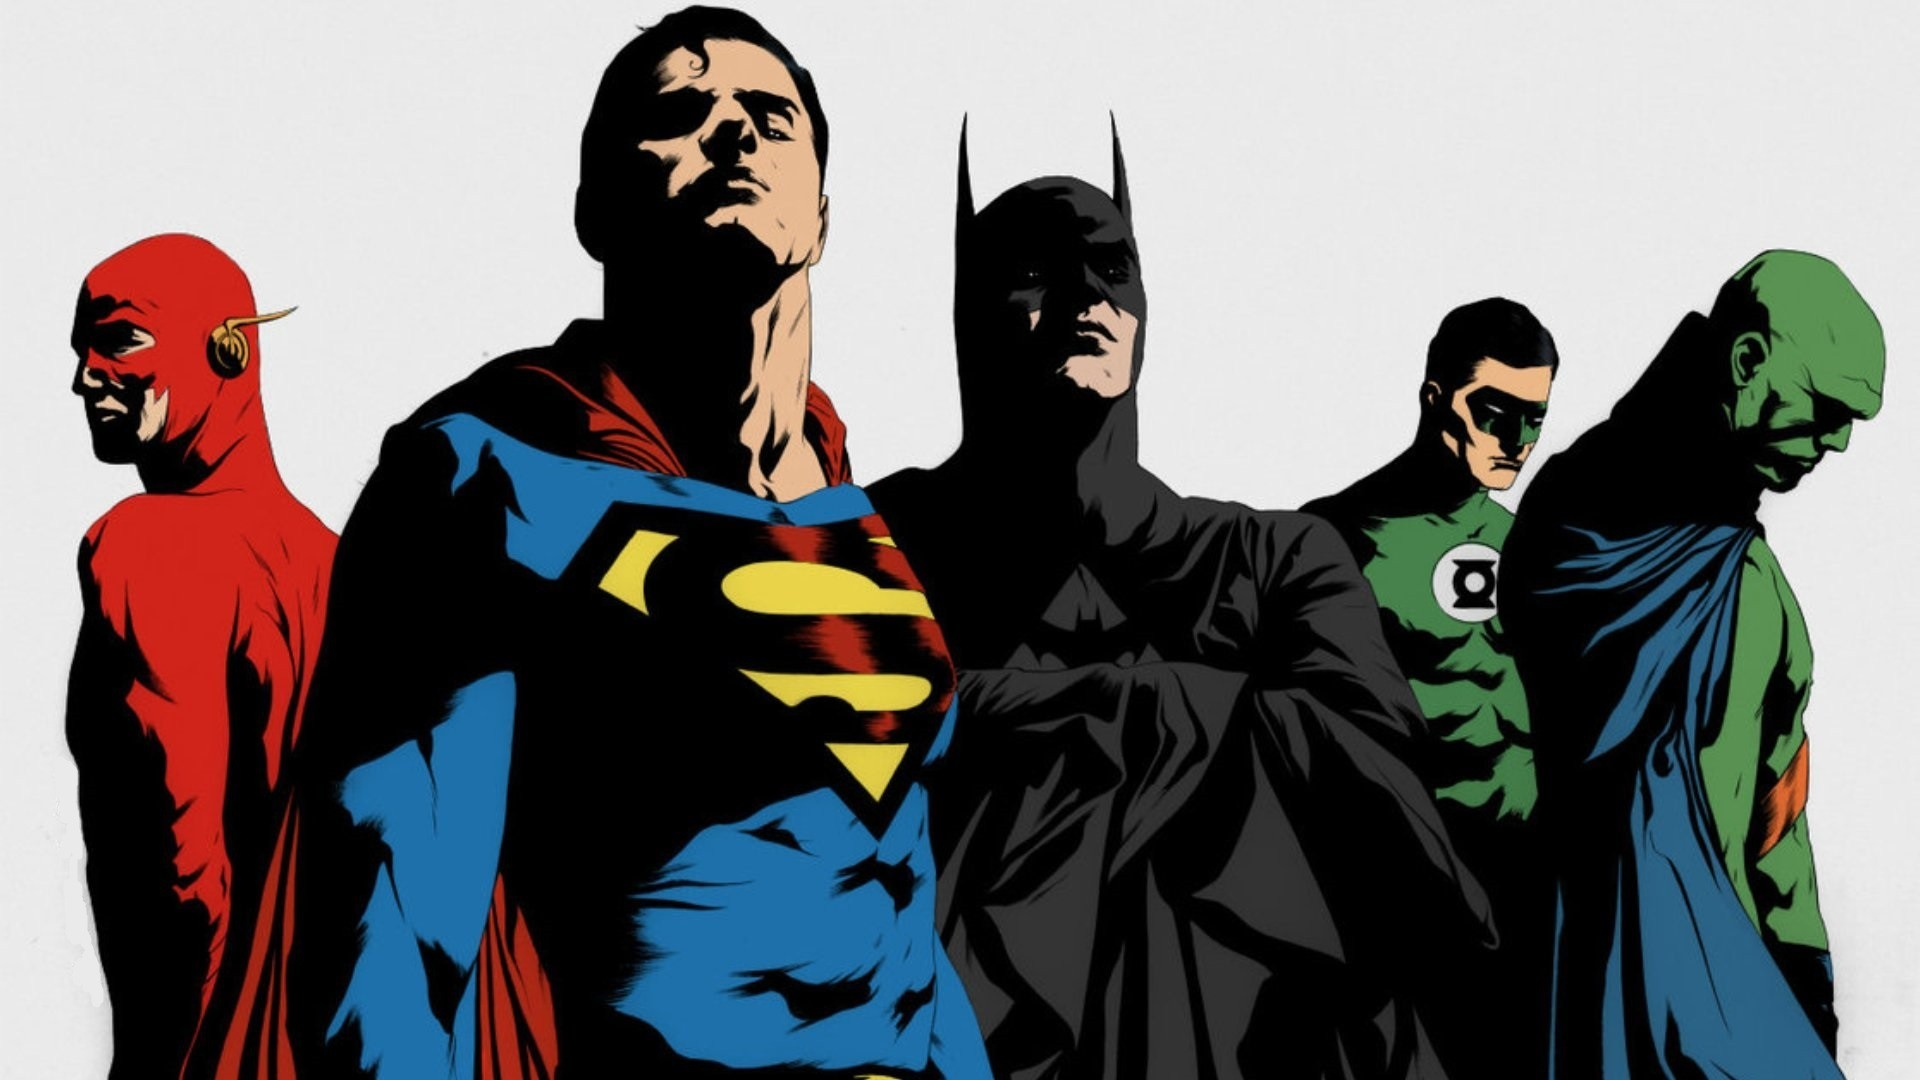 Download Wallpaper Mac Superhero - 1128811-free-download-super-hero-backgrounds-1920x1080-for-macbook  Pic_49421.jpg